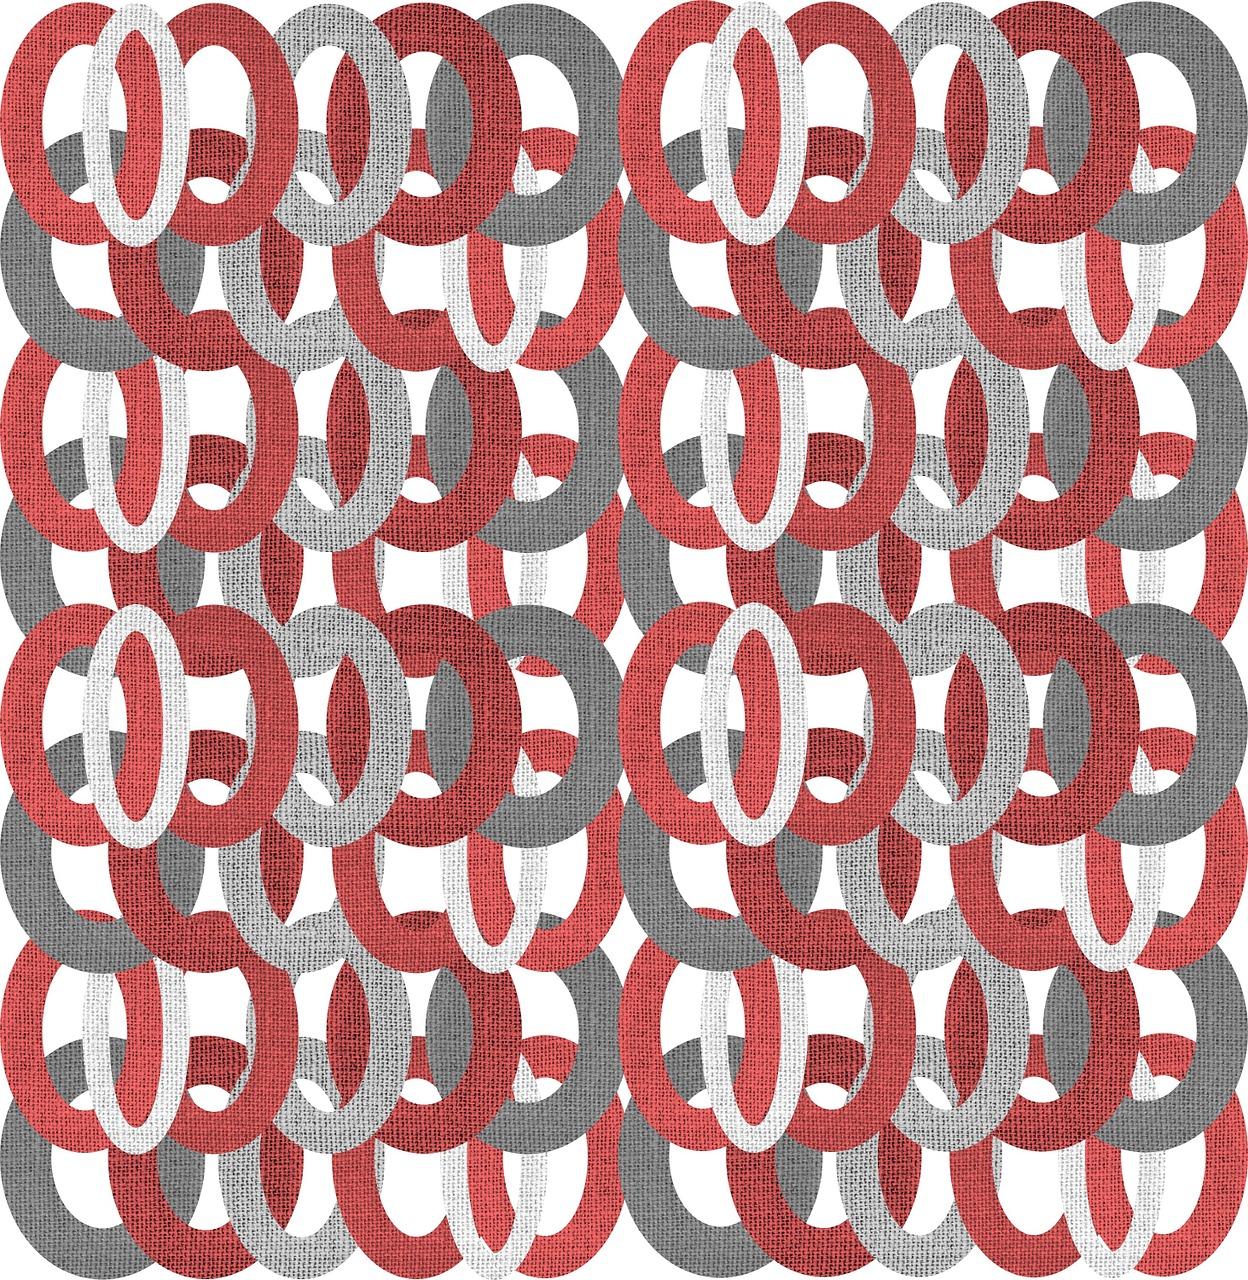 fabric-1211687_1280.jpg